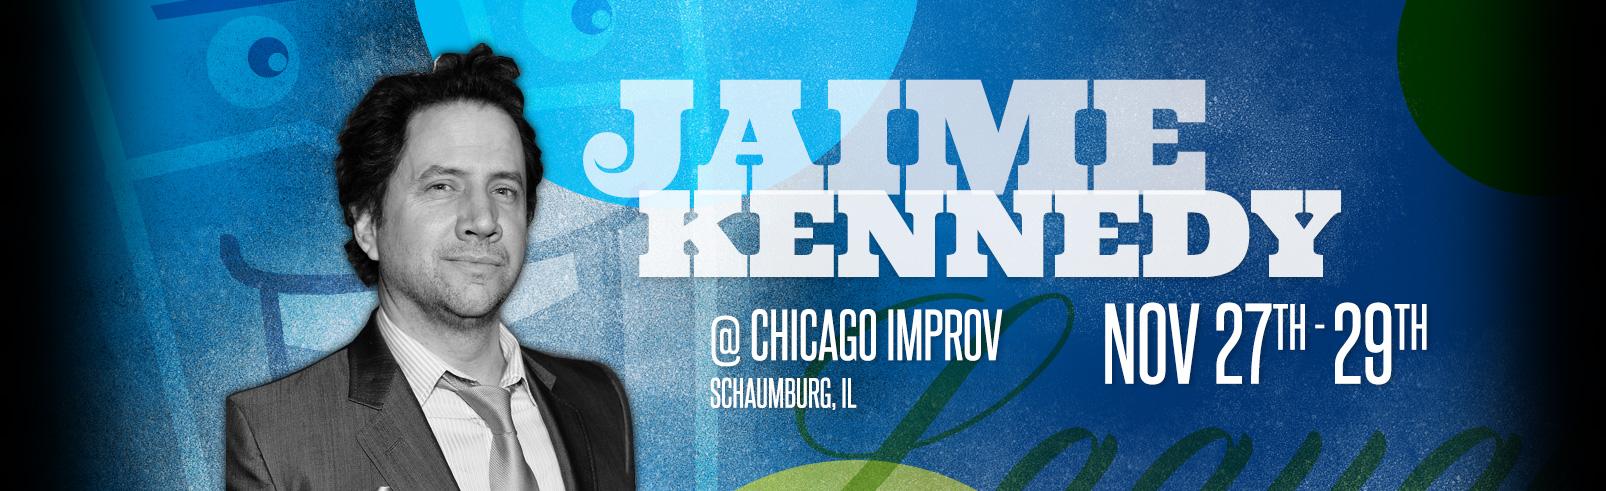 Jamie Kennedy @ Chicago Improv